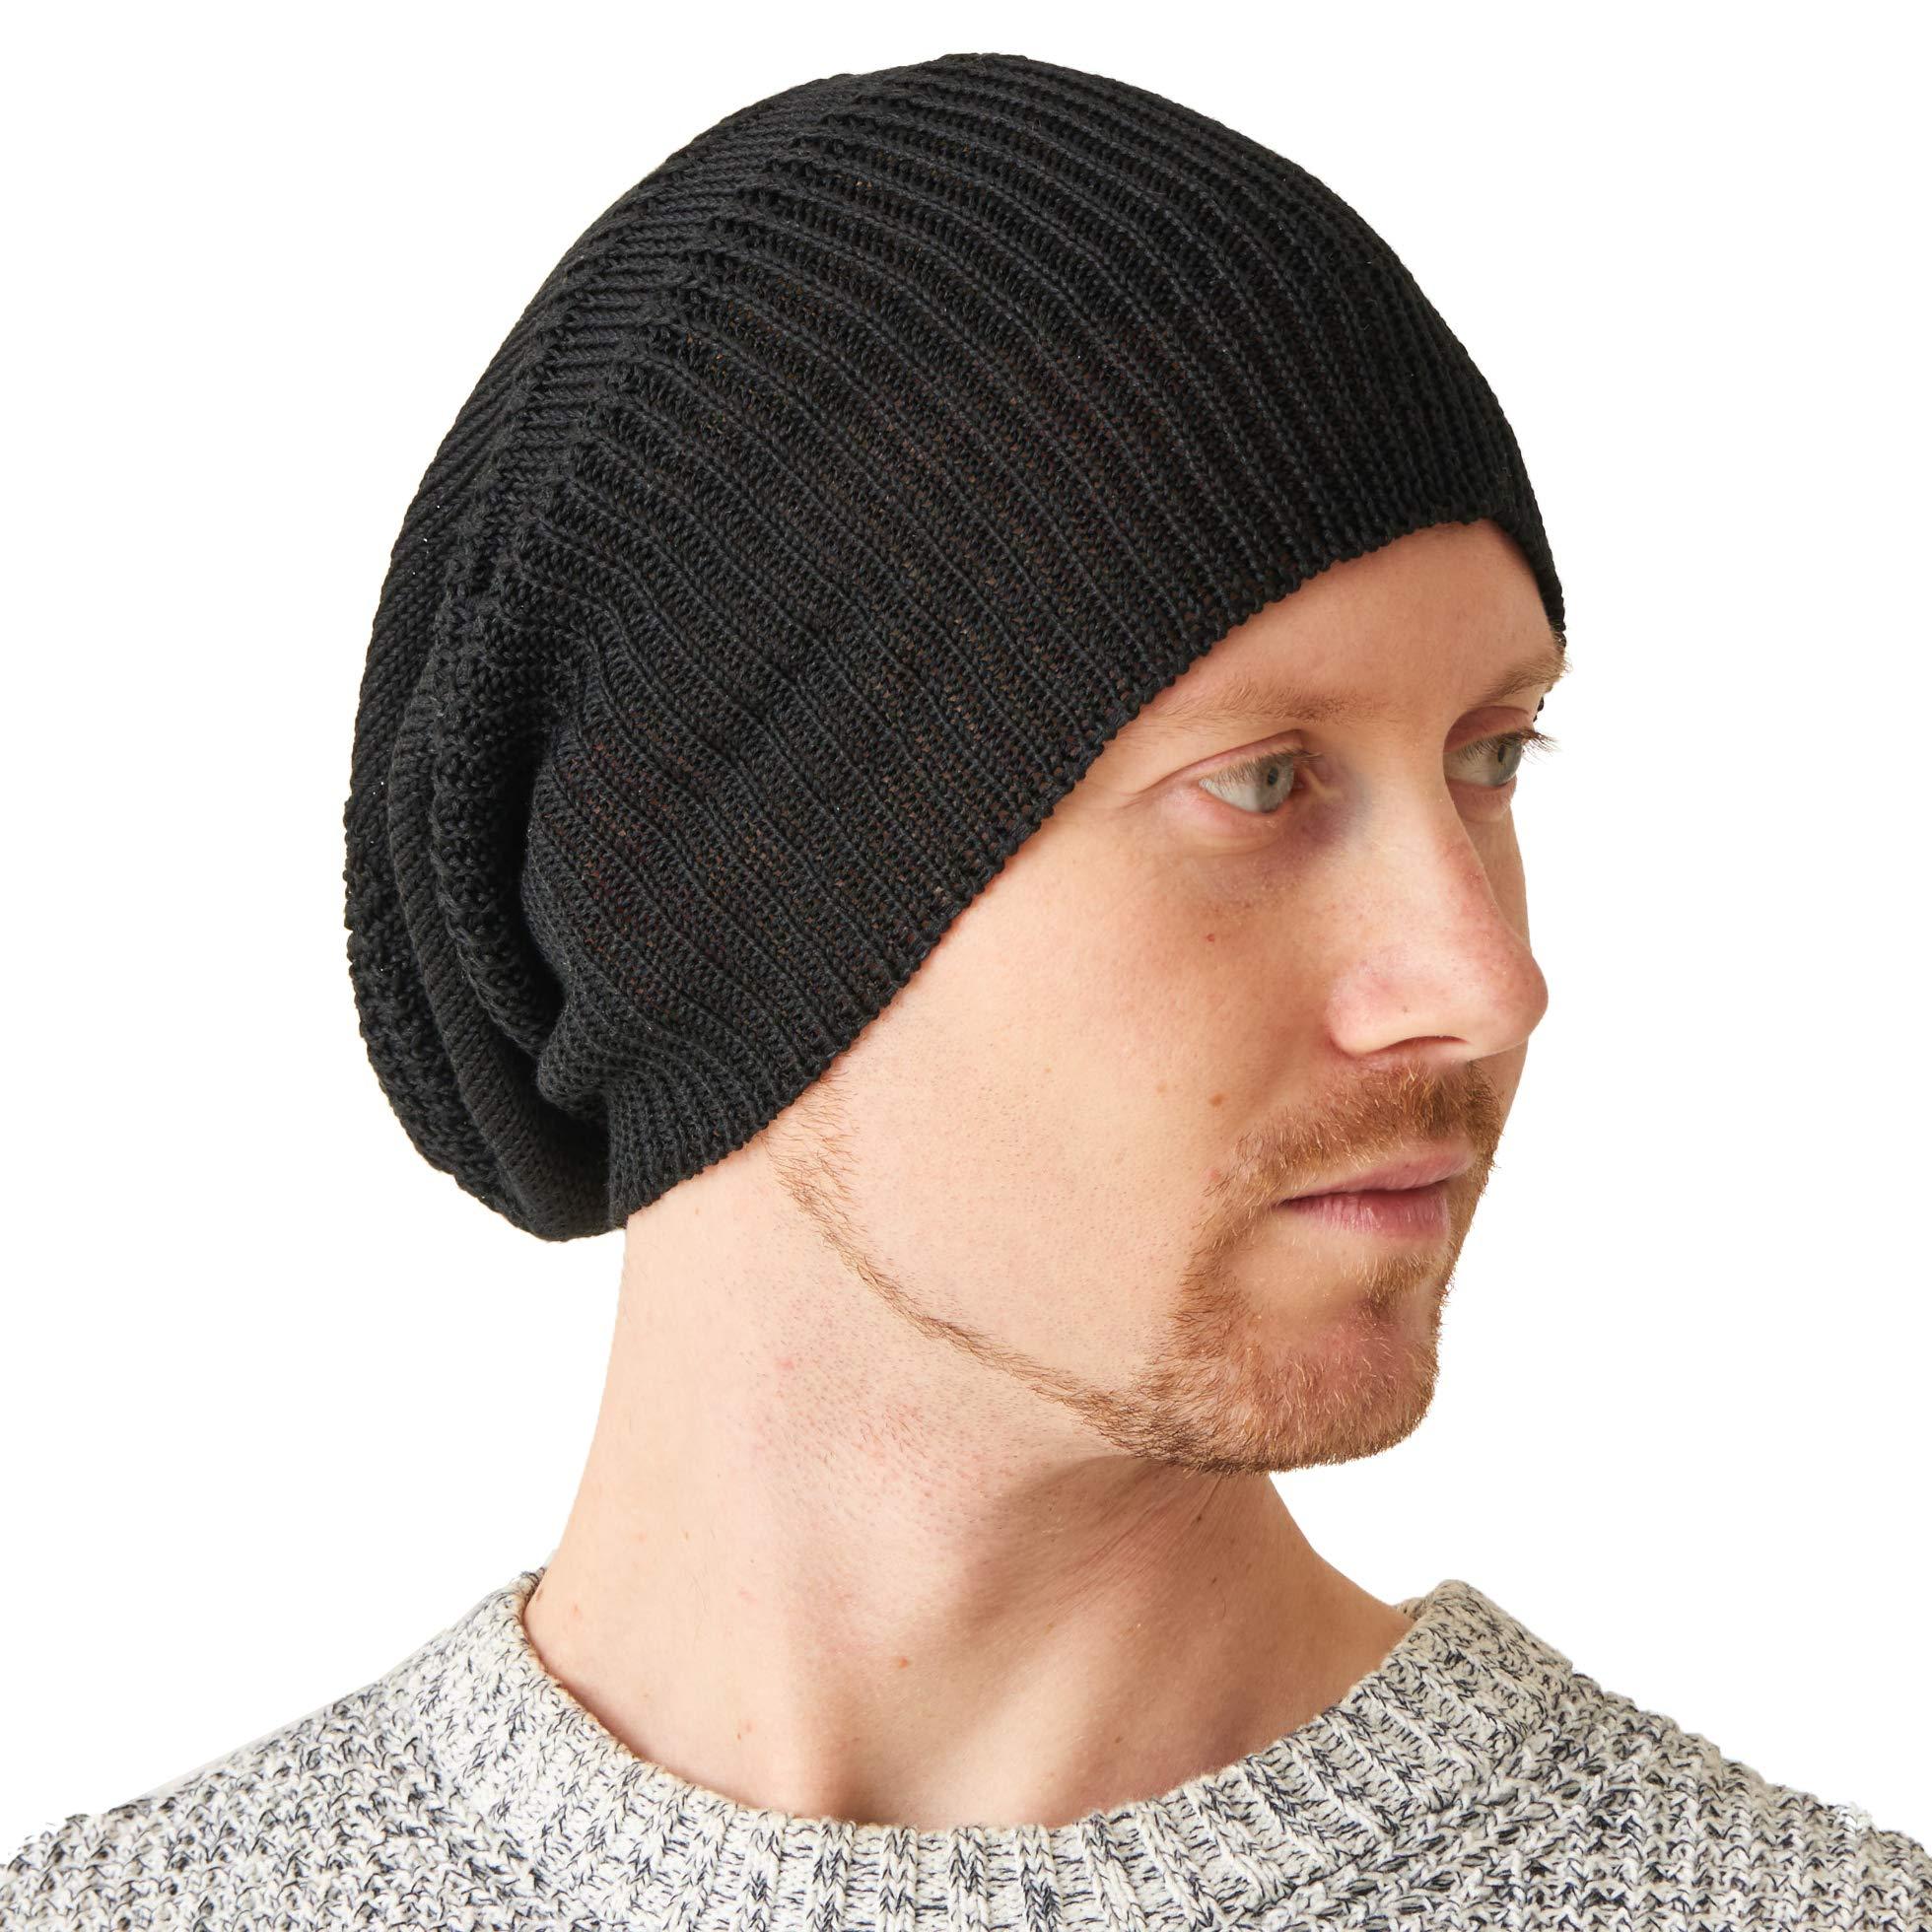 CHARM Silk Slouchy Beanie Womens - Mens Slouch Hat for Summer Chemo Cap 100% Silk Knit Black